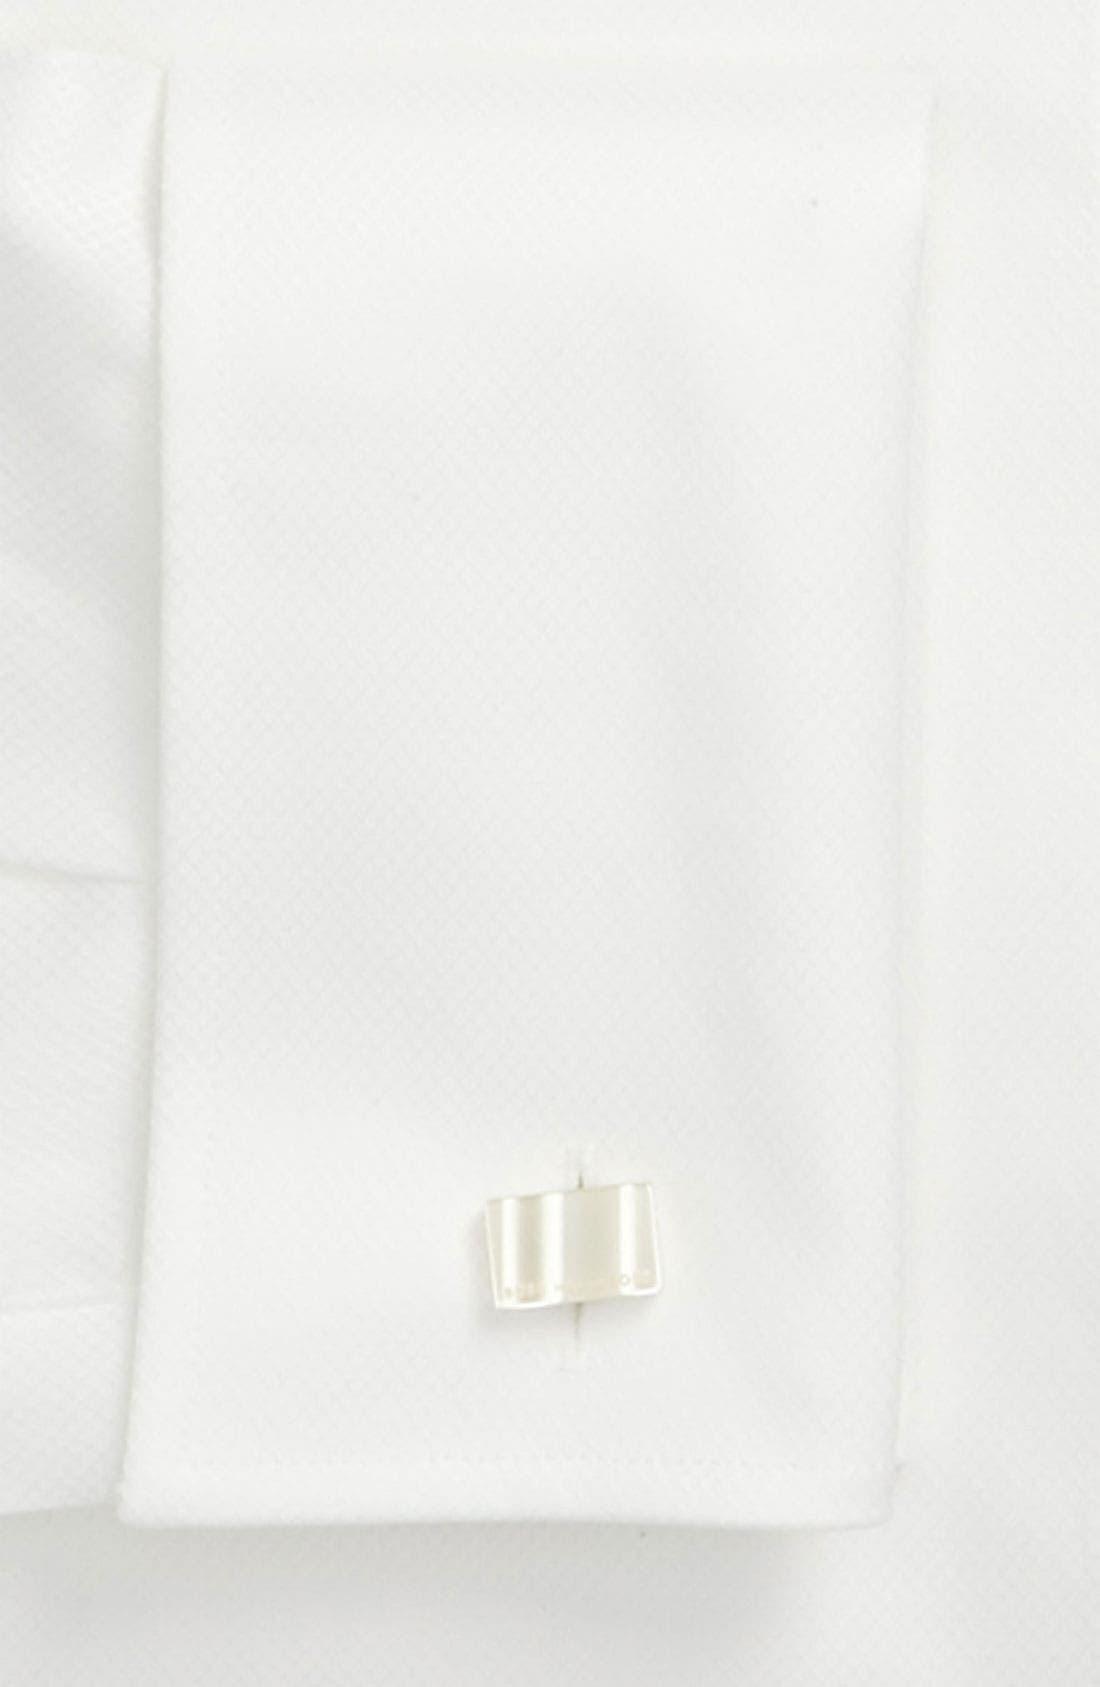 BOSS, Jameson Slim Fit Diamond Weave French Cuff Tuxedo Shirt, Alternate thumbnail 3, color, 120